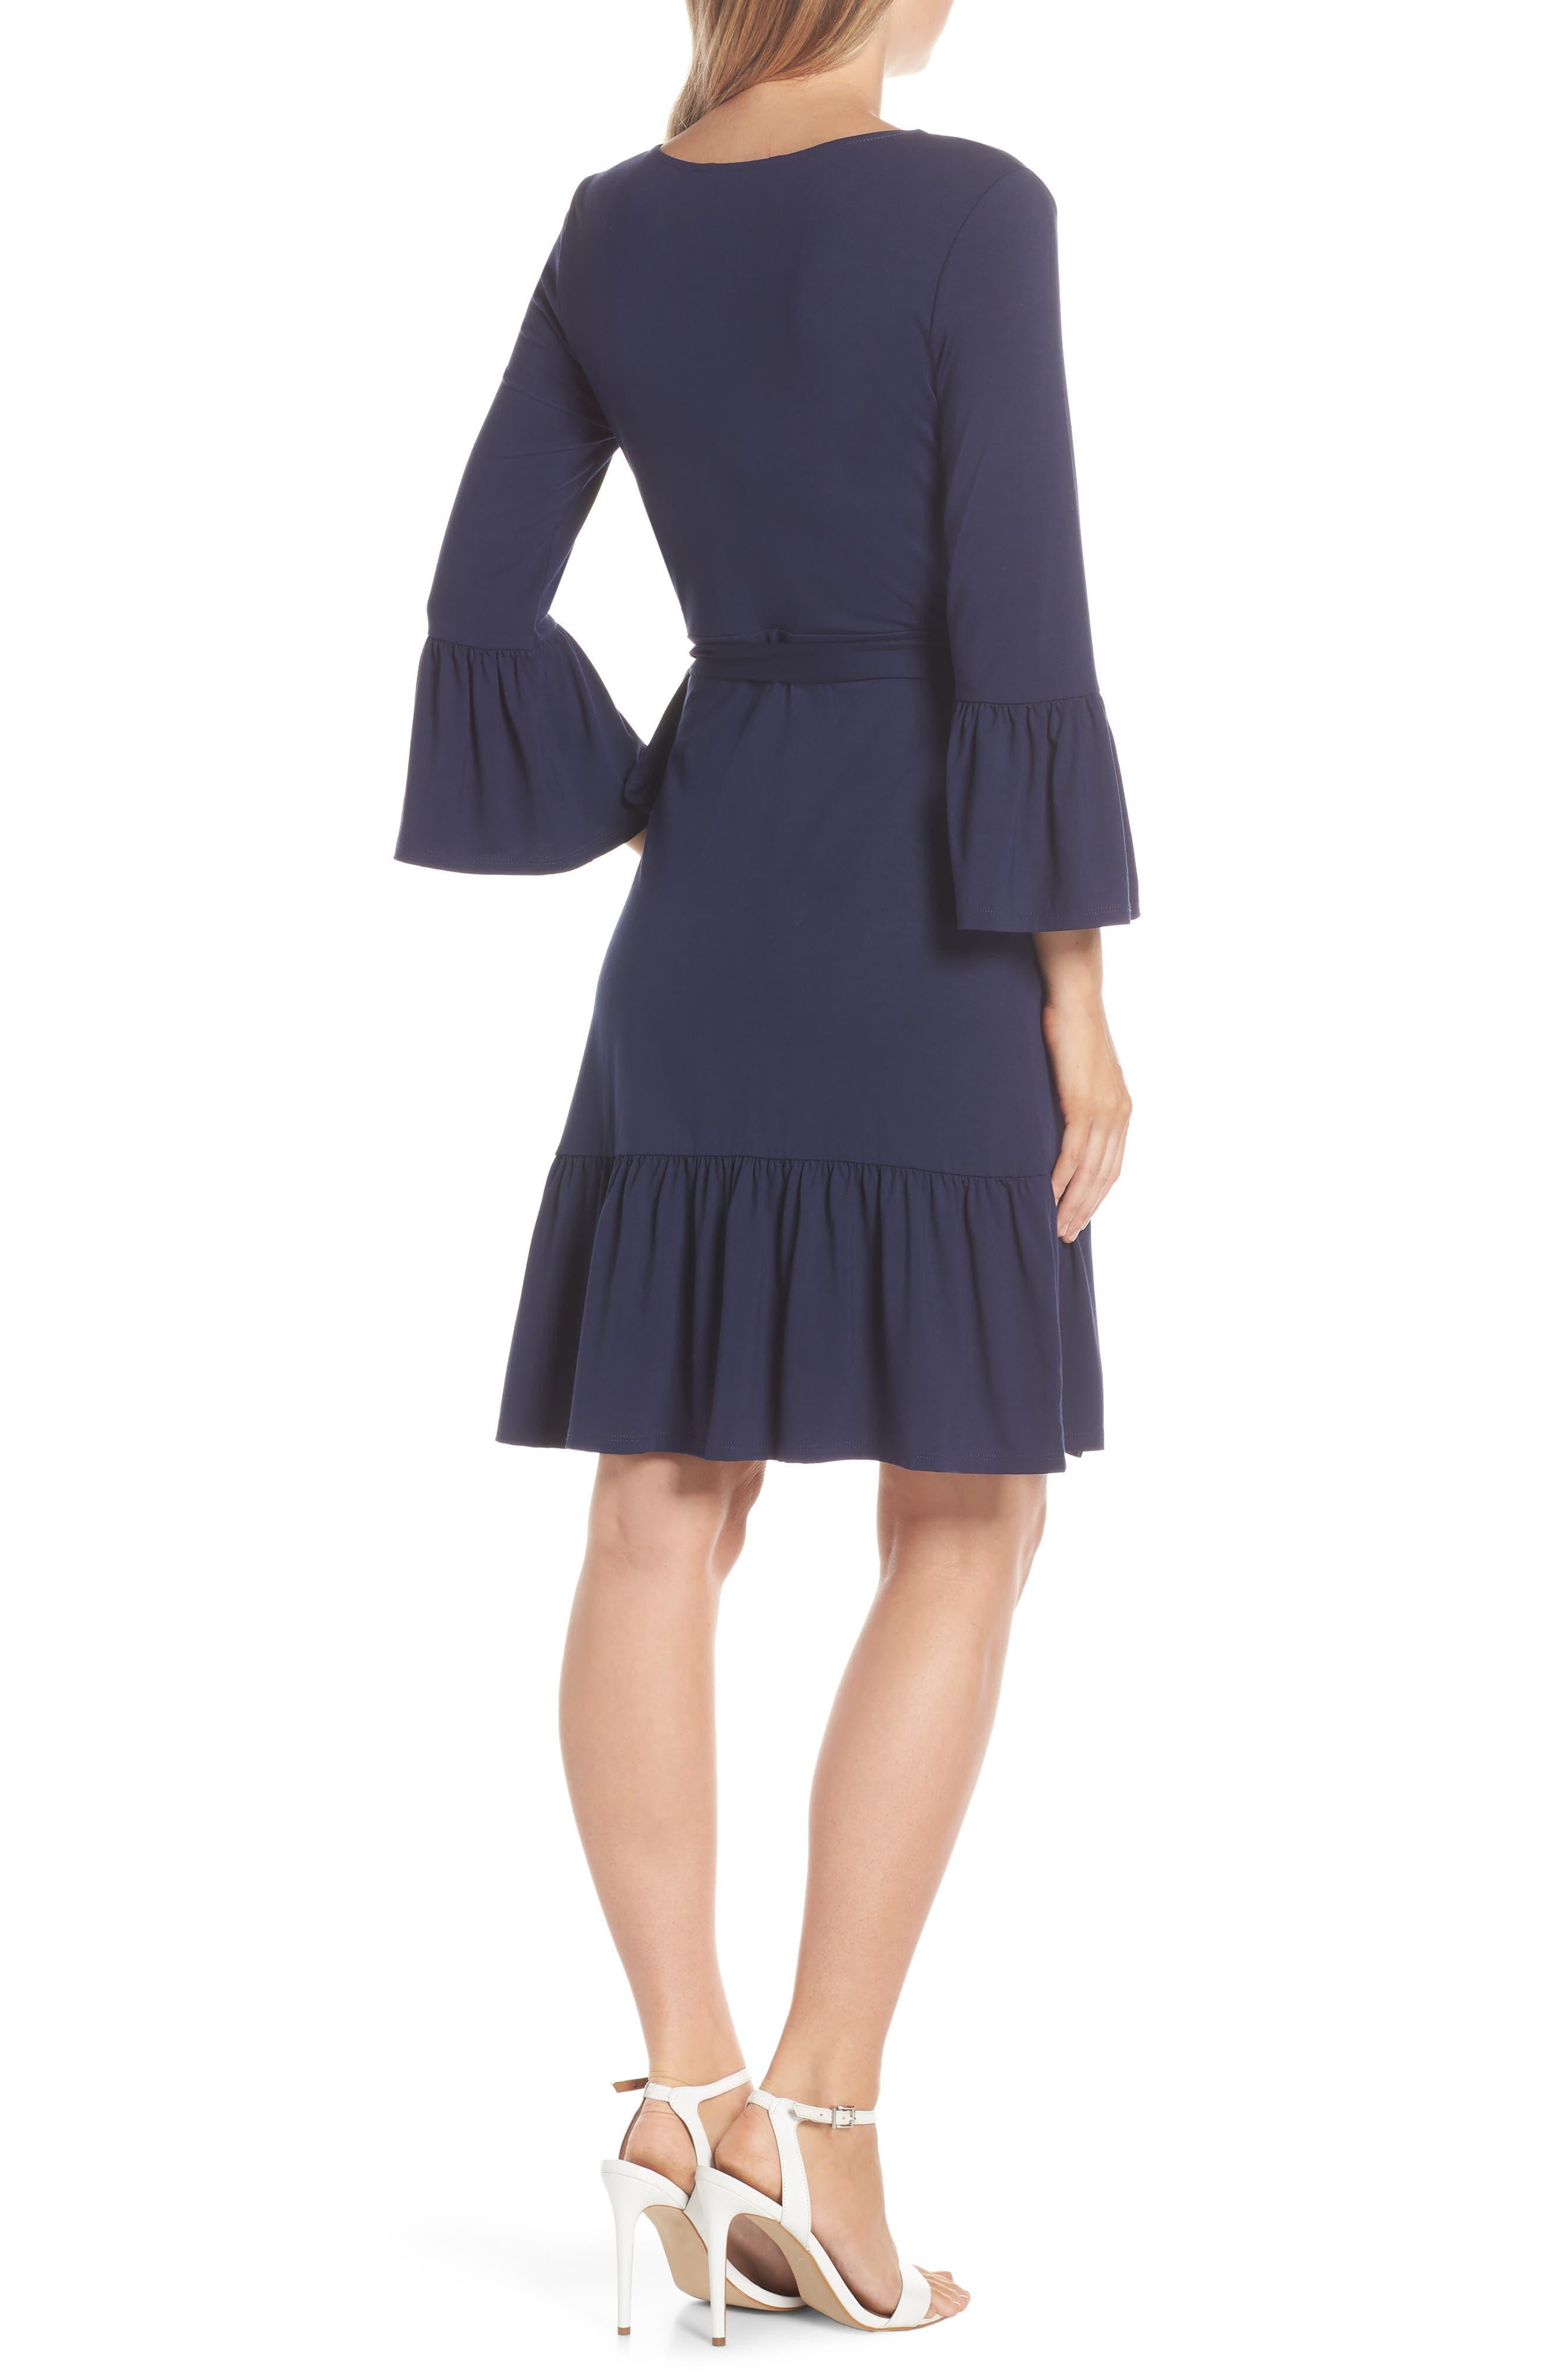 LILLY PULITZER<SUP>®</SUP>, Misha Wrap Dress, Alternate thumbnail 2, color, TRUE NAVY